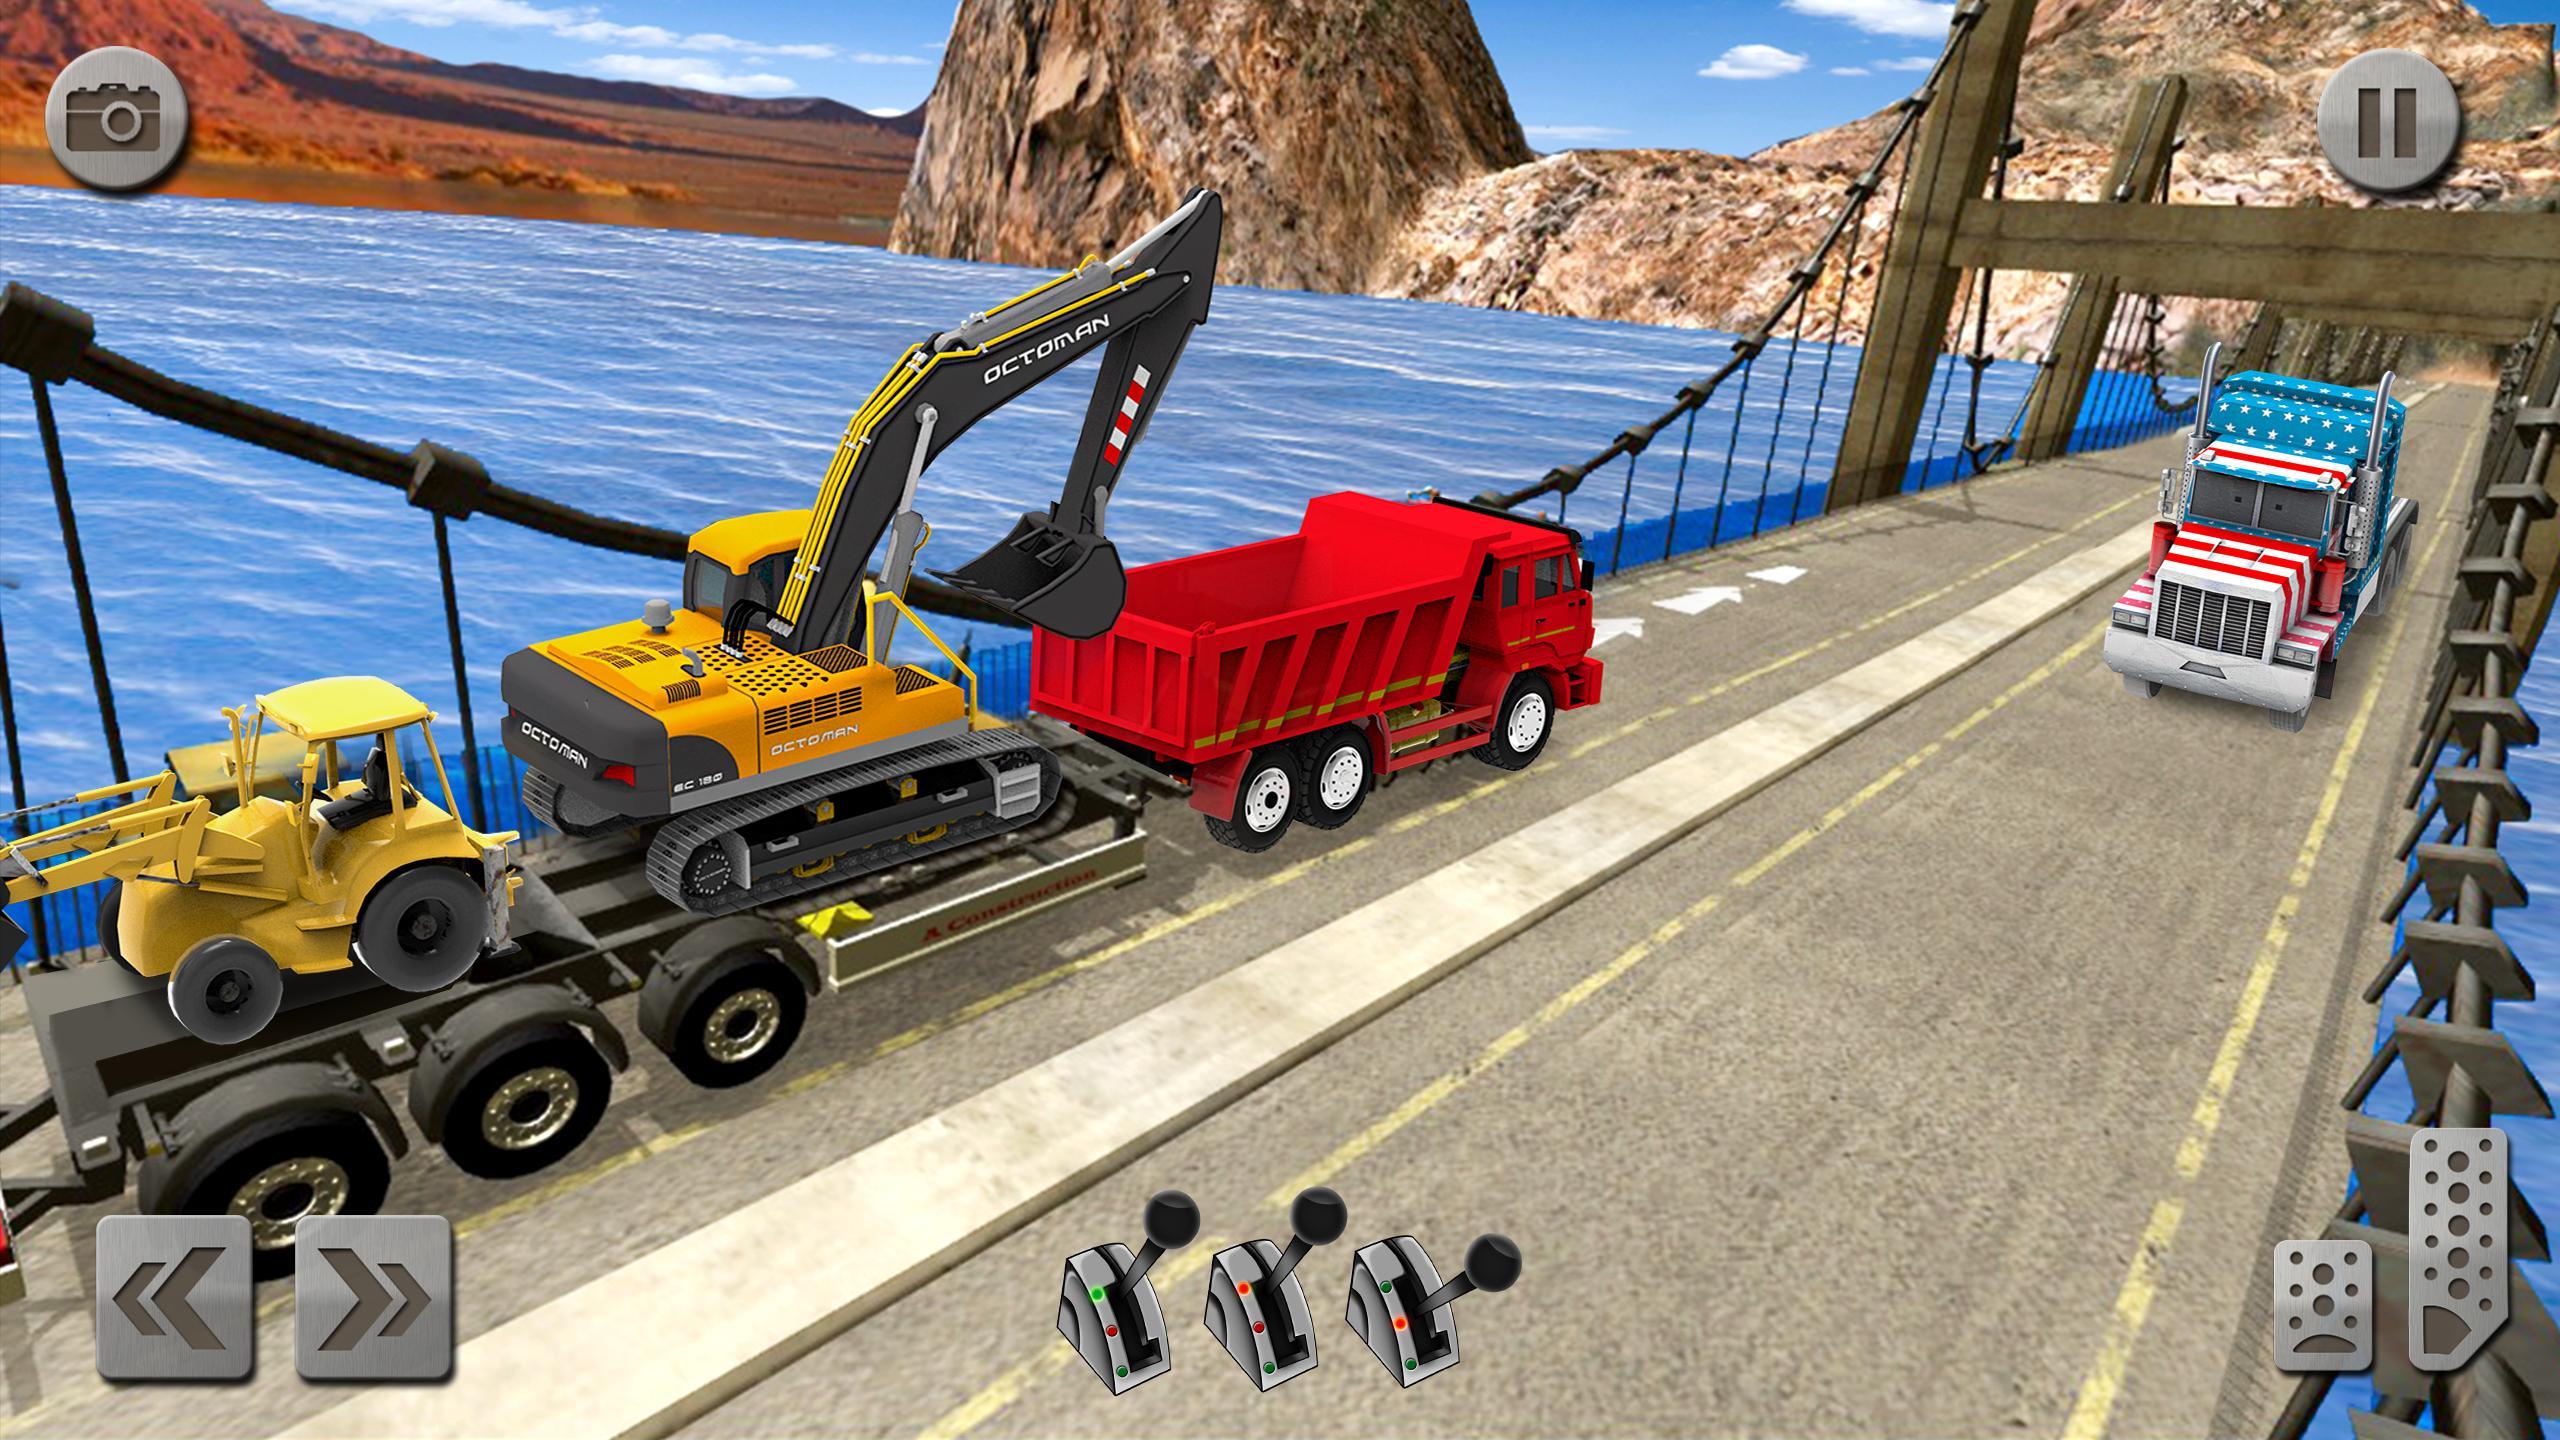 Sand Excavator Truck Driving Rescue Simulator game 5.2 Screenshot 2